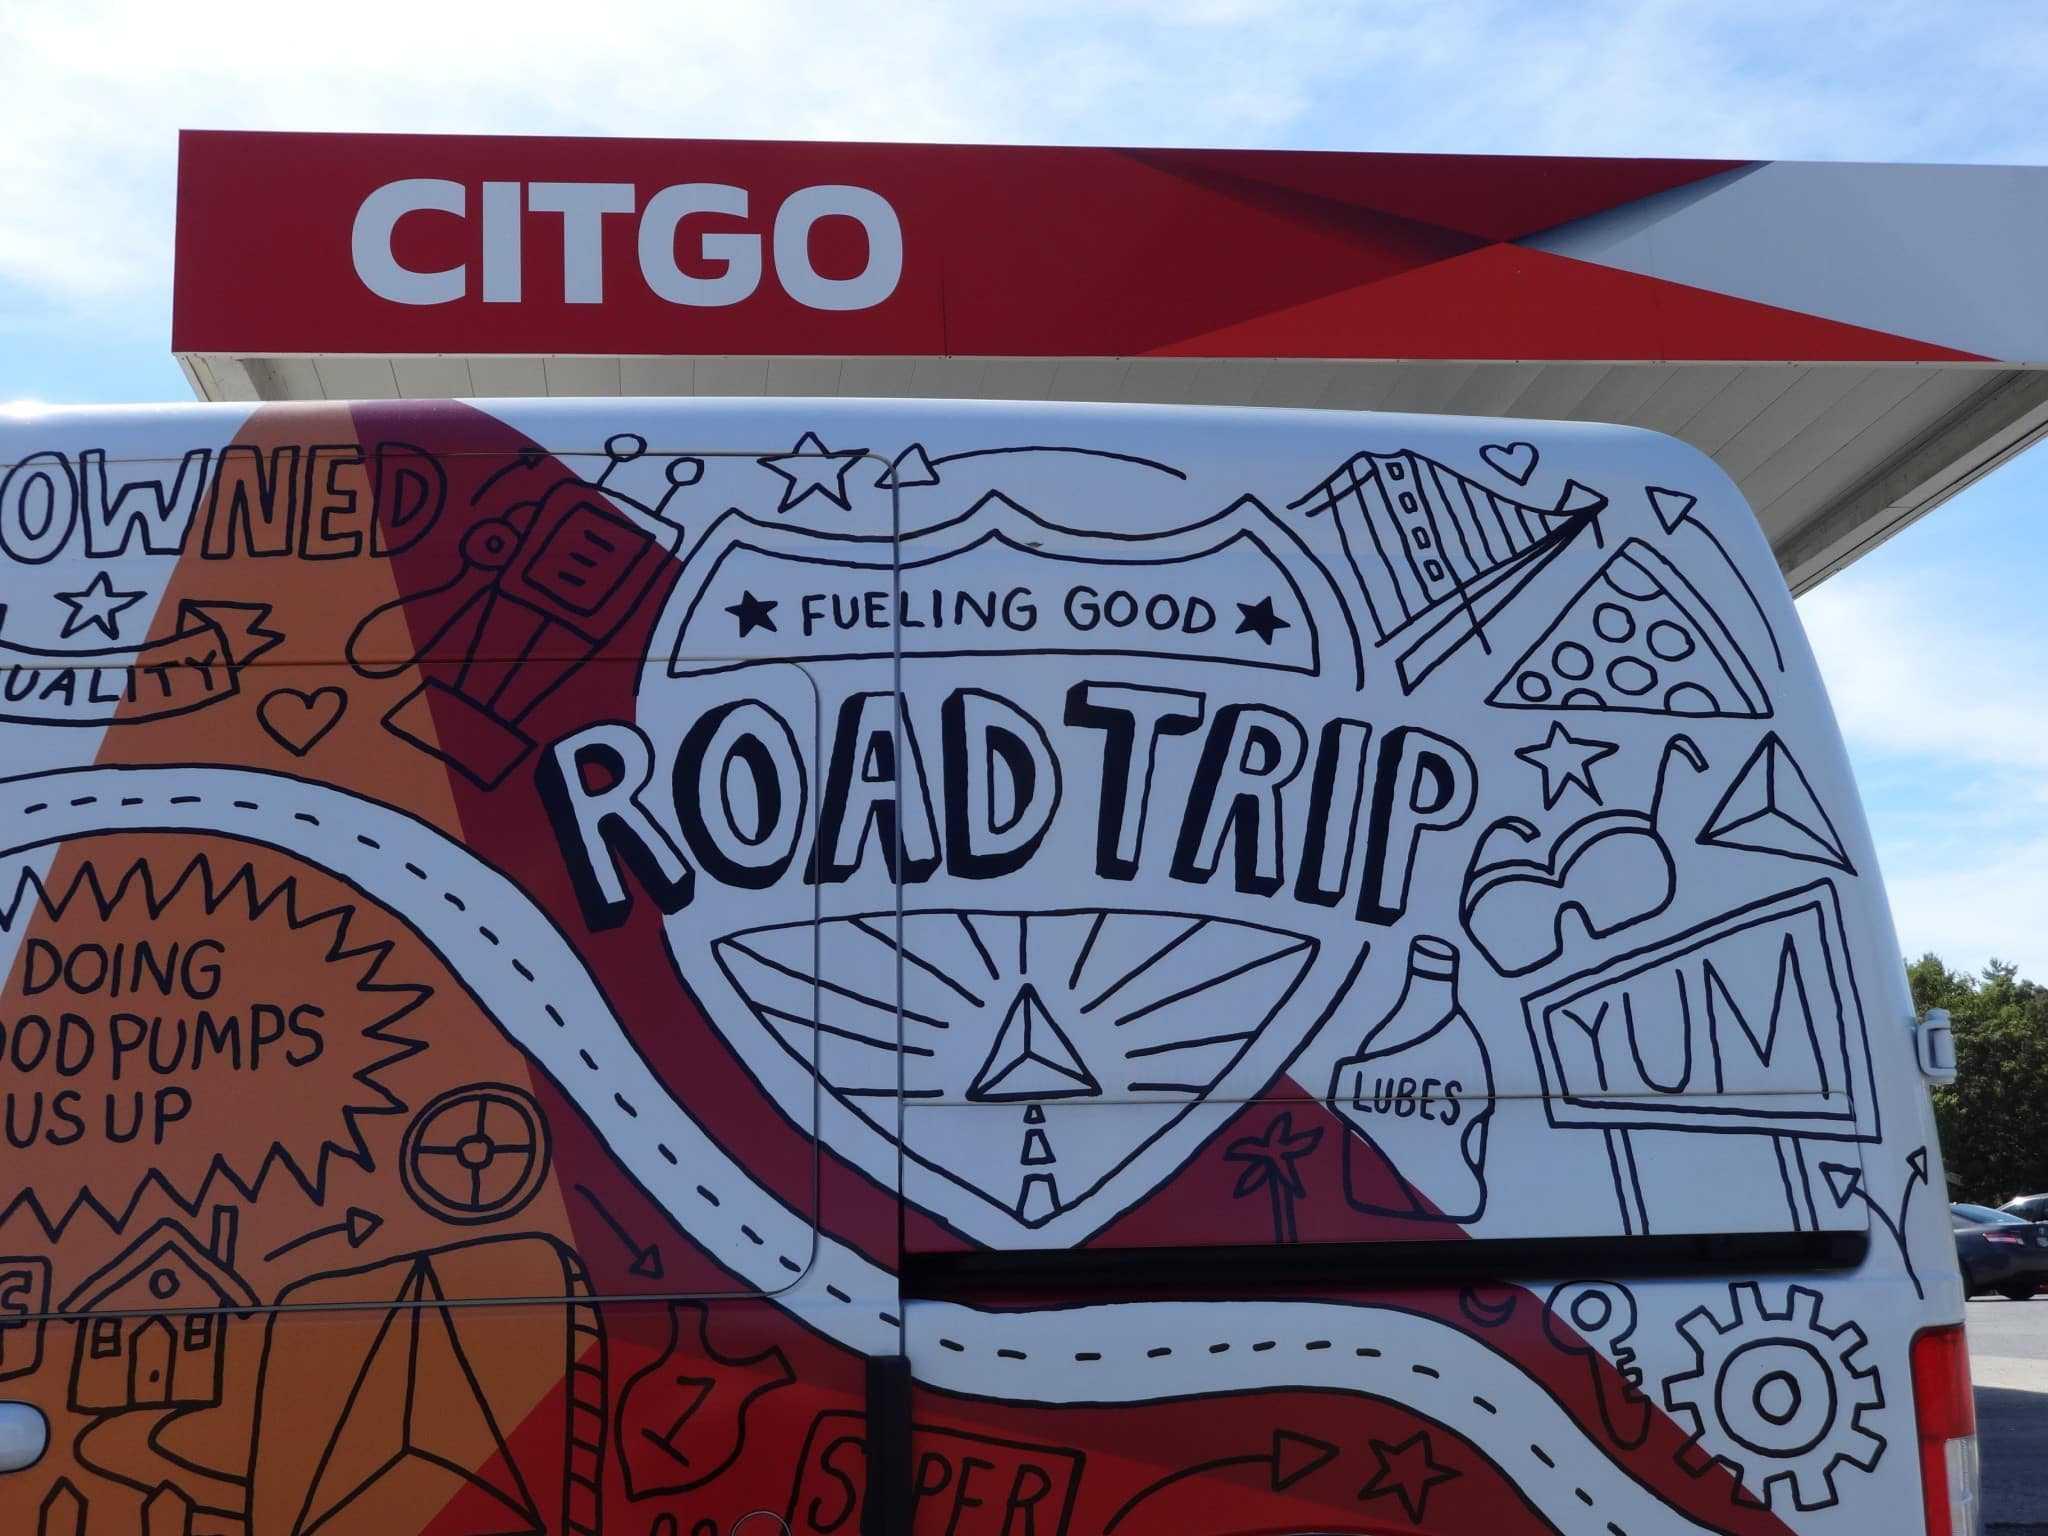 citgo fueling good road trip 20